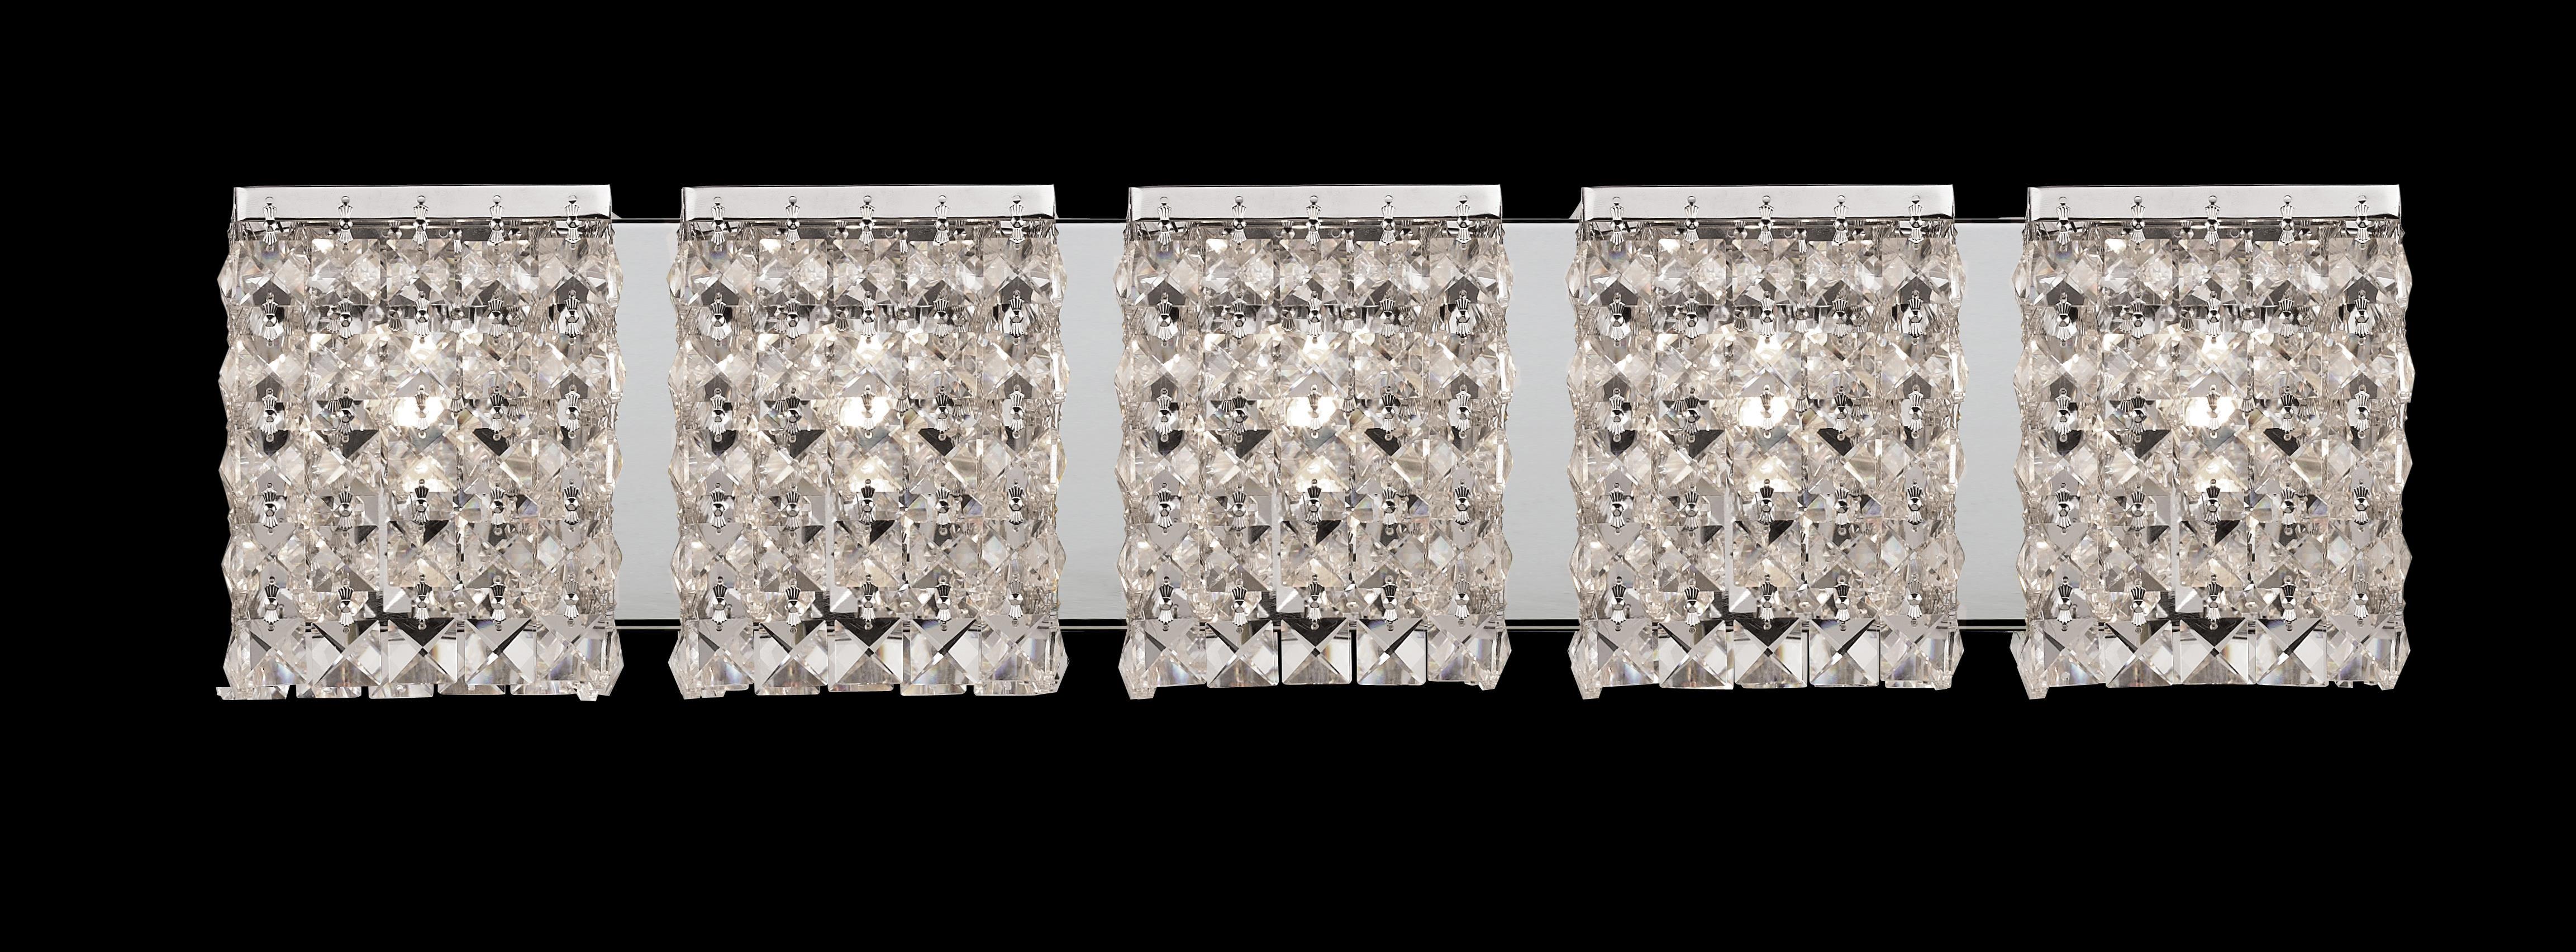 Crystal Vanity Lights for Bathroom Modern Great Crystal Bathroom Vanity Light Fixtures P In Creative Small Photo